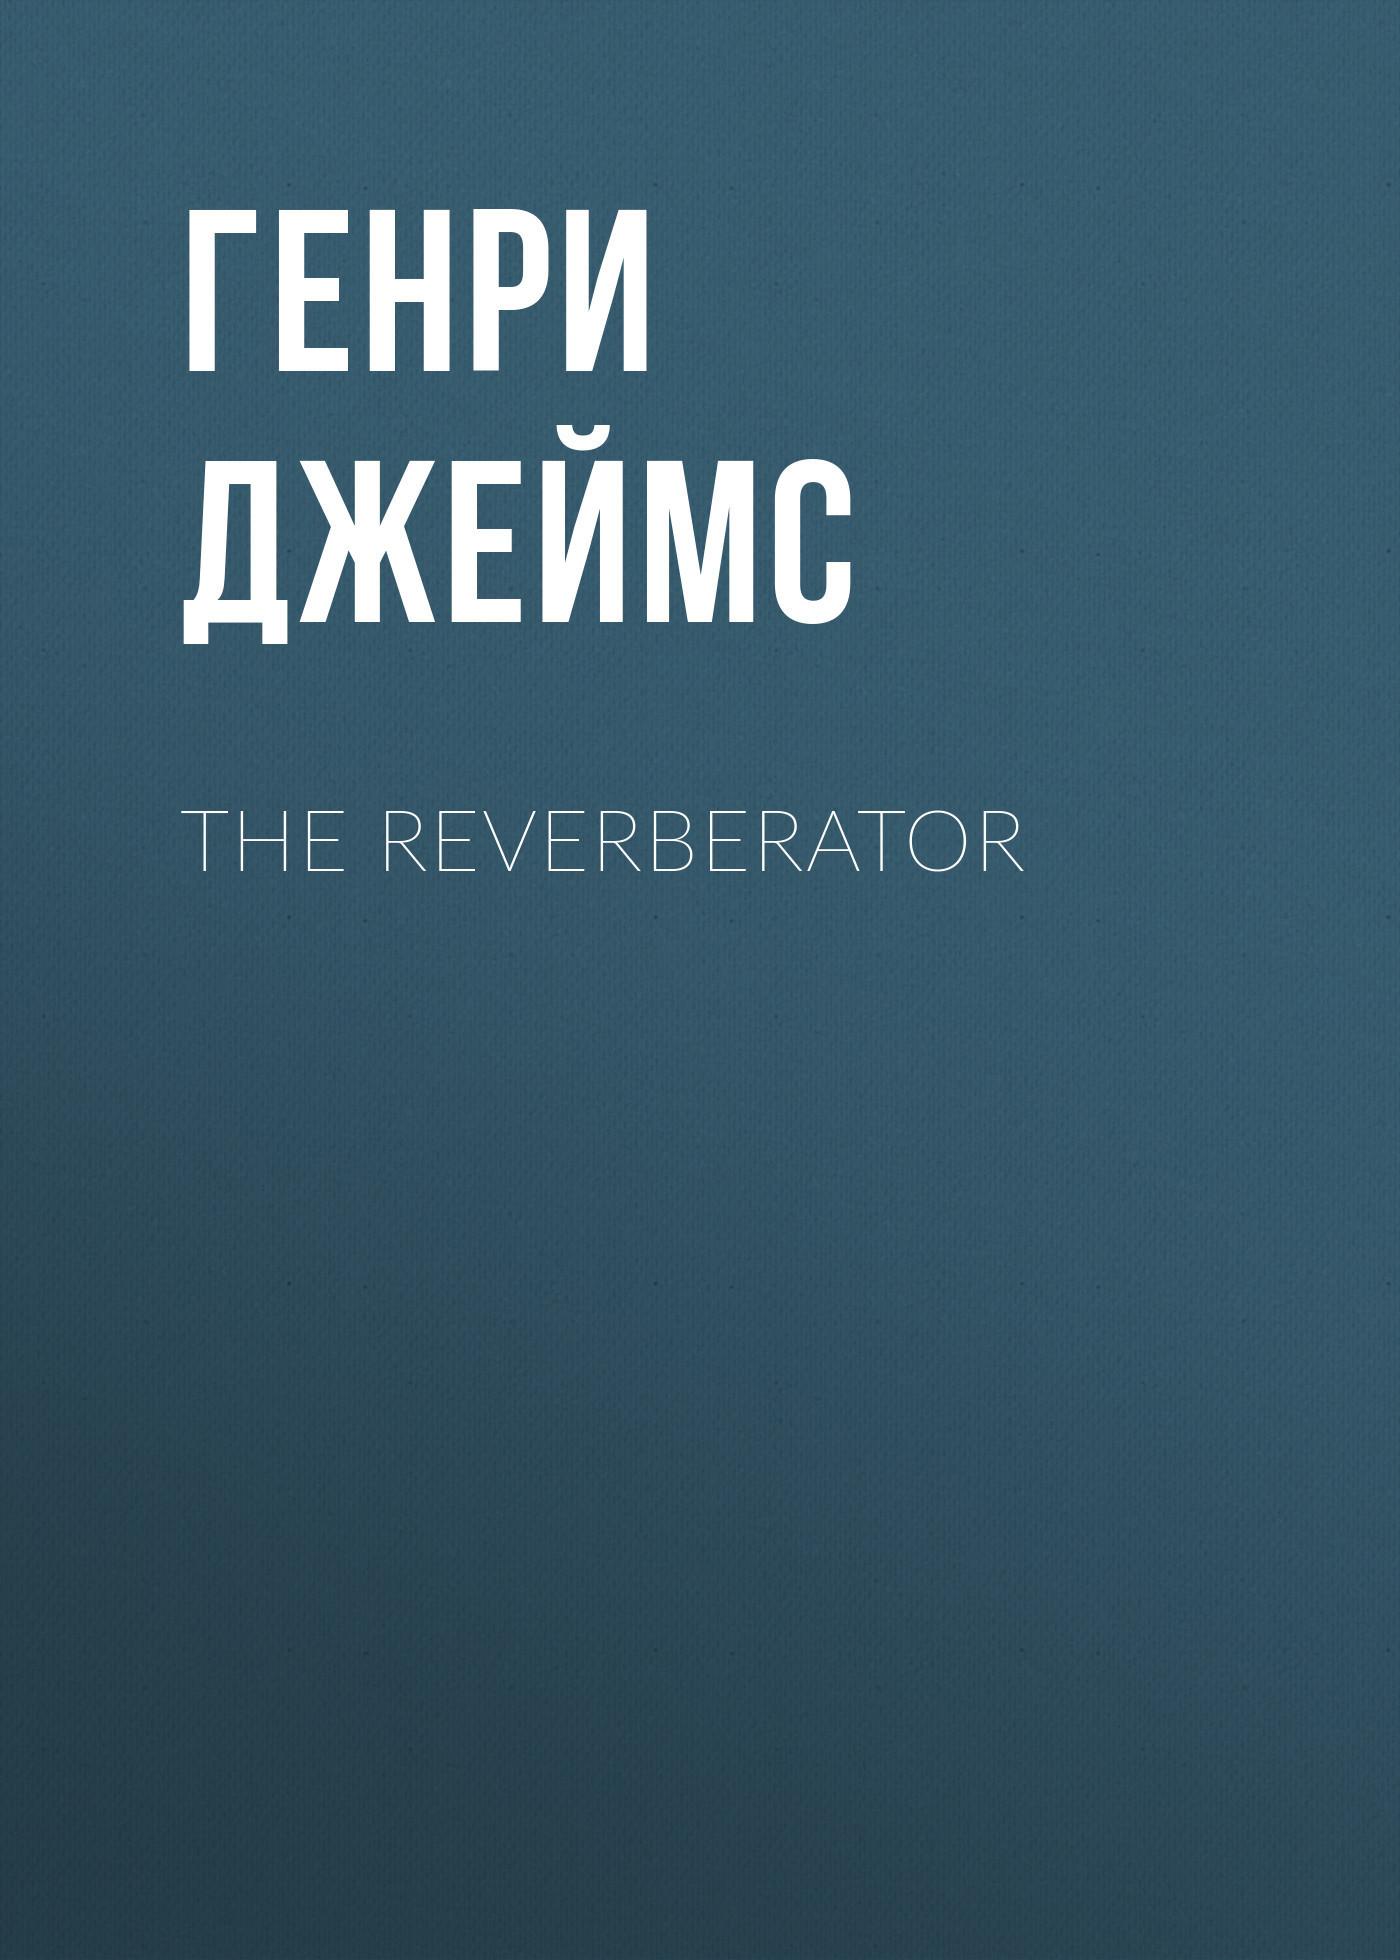 Генри Джеймс The Reverberator the reverberator